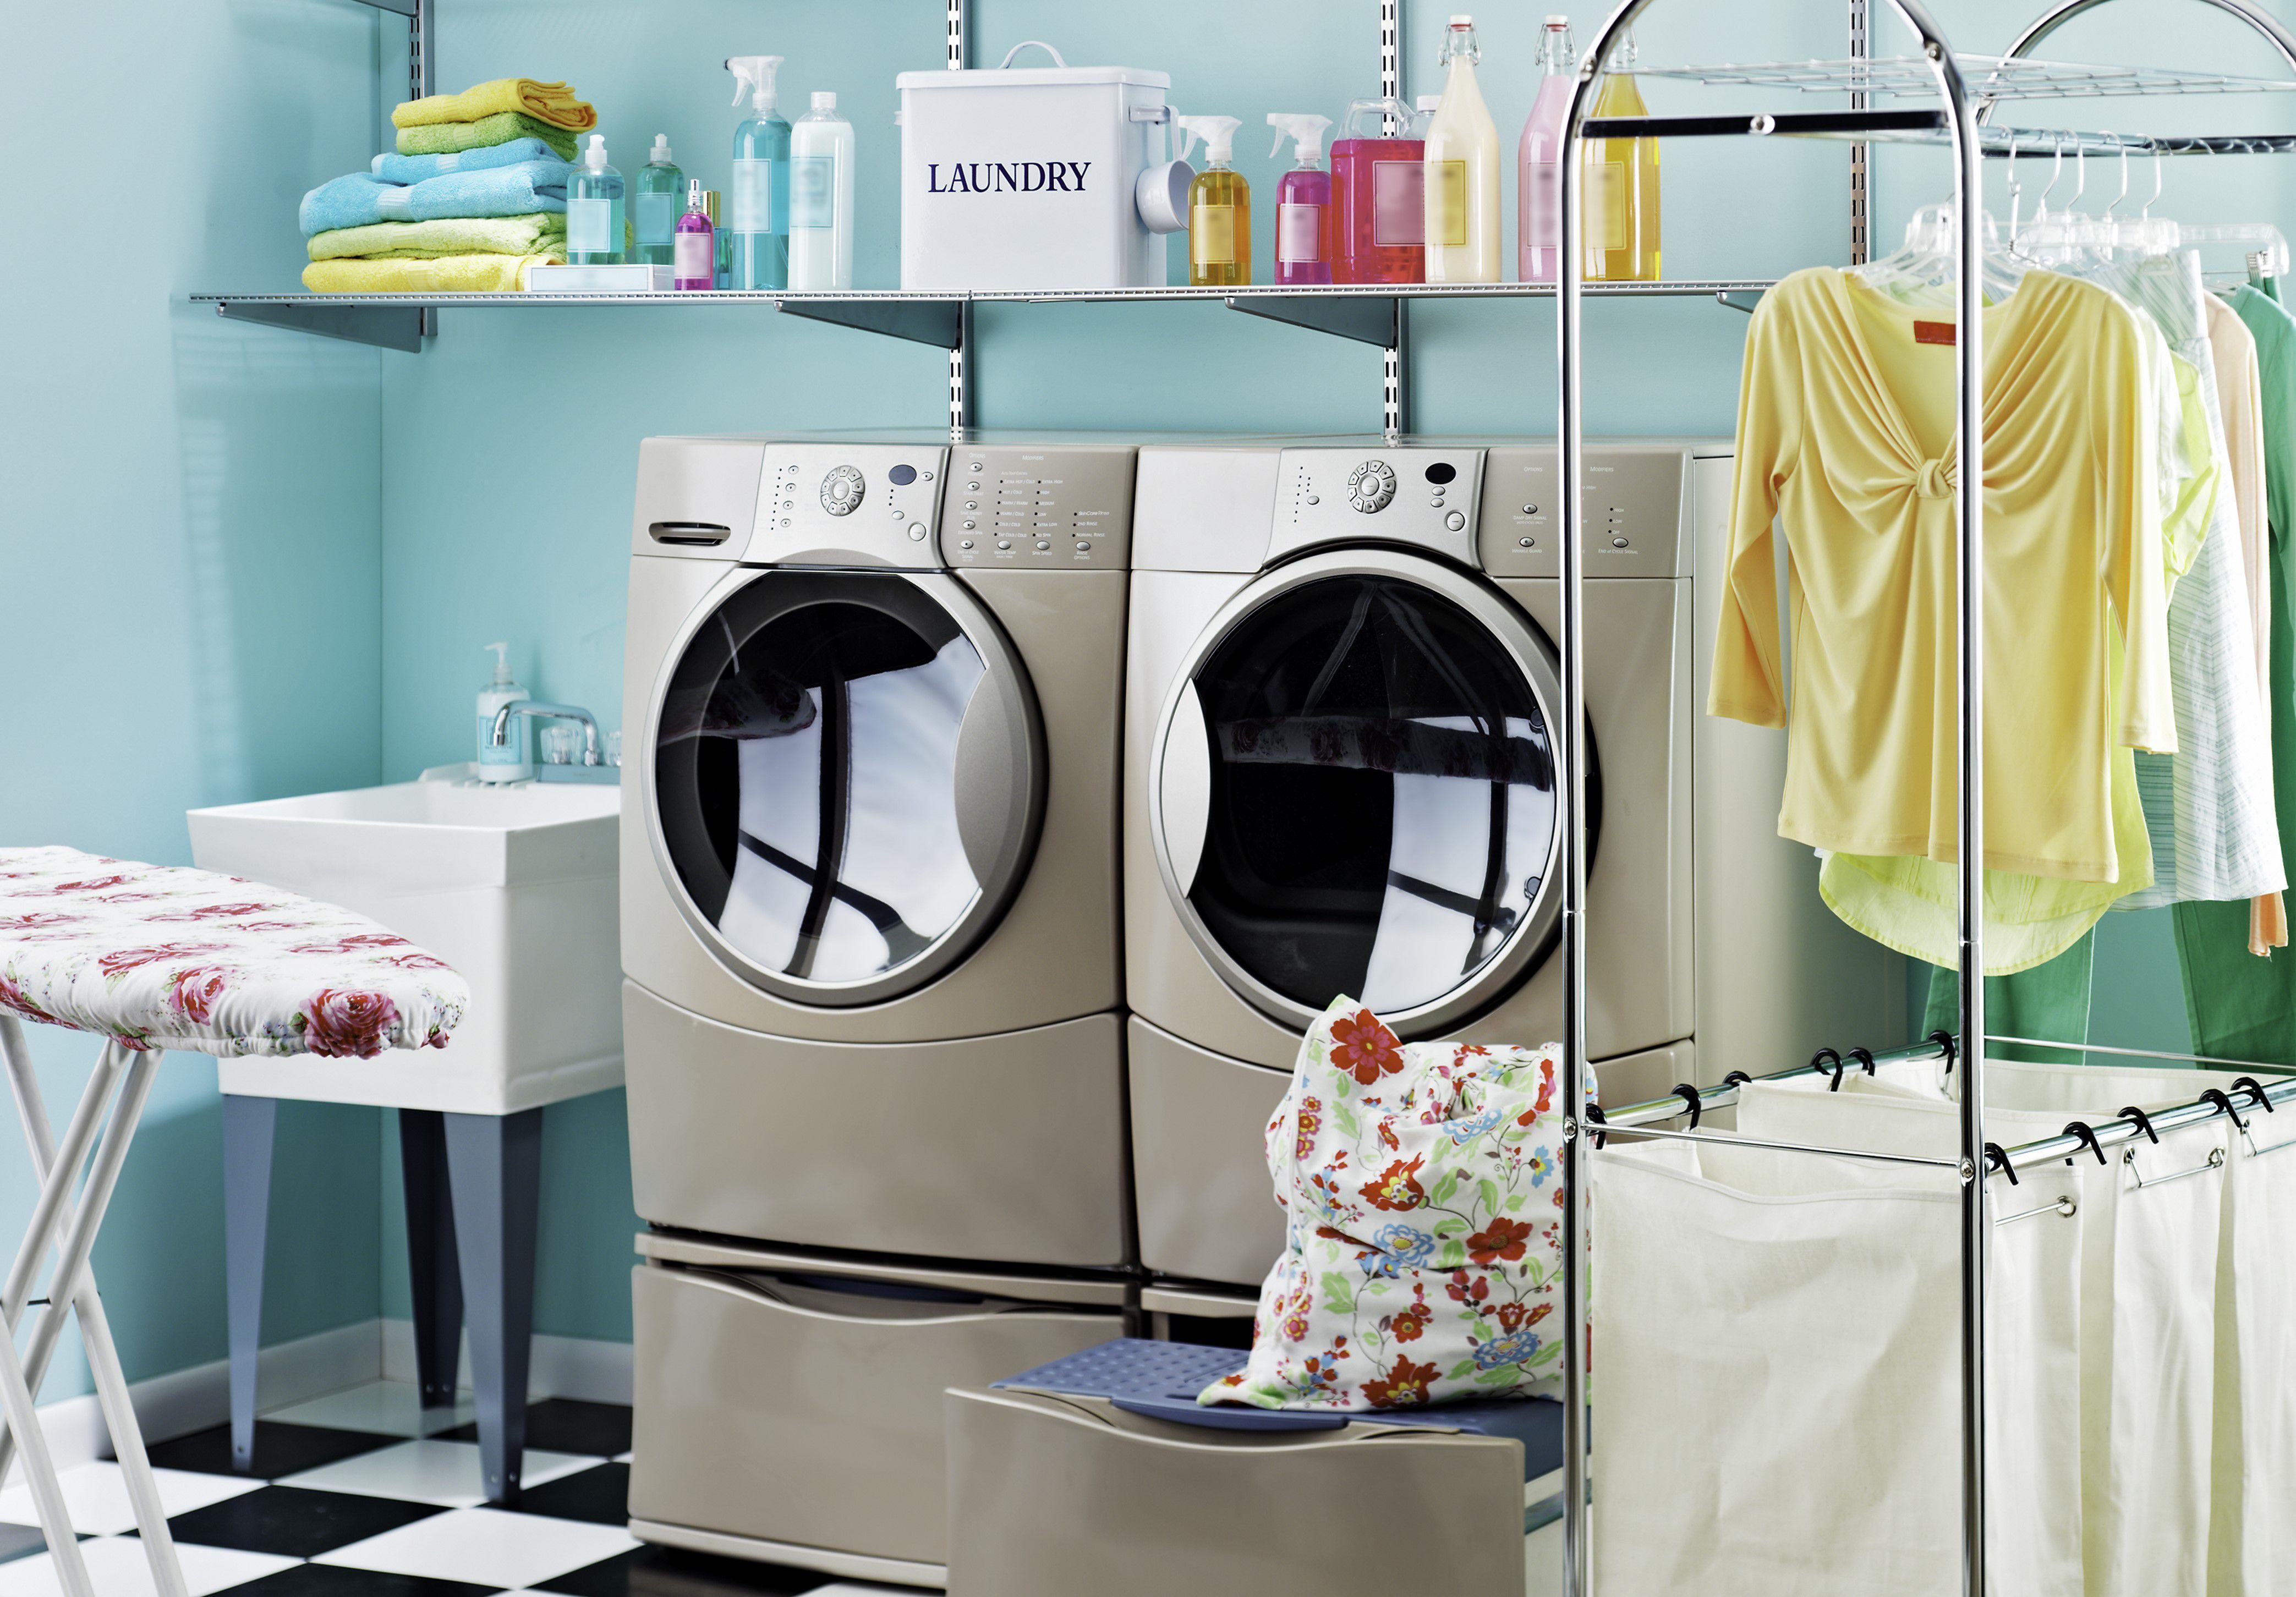 13 Helpful Laundry Room Gadgets